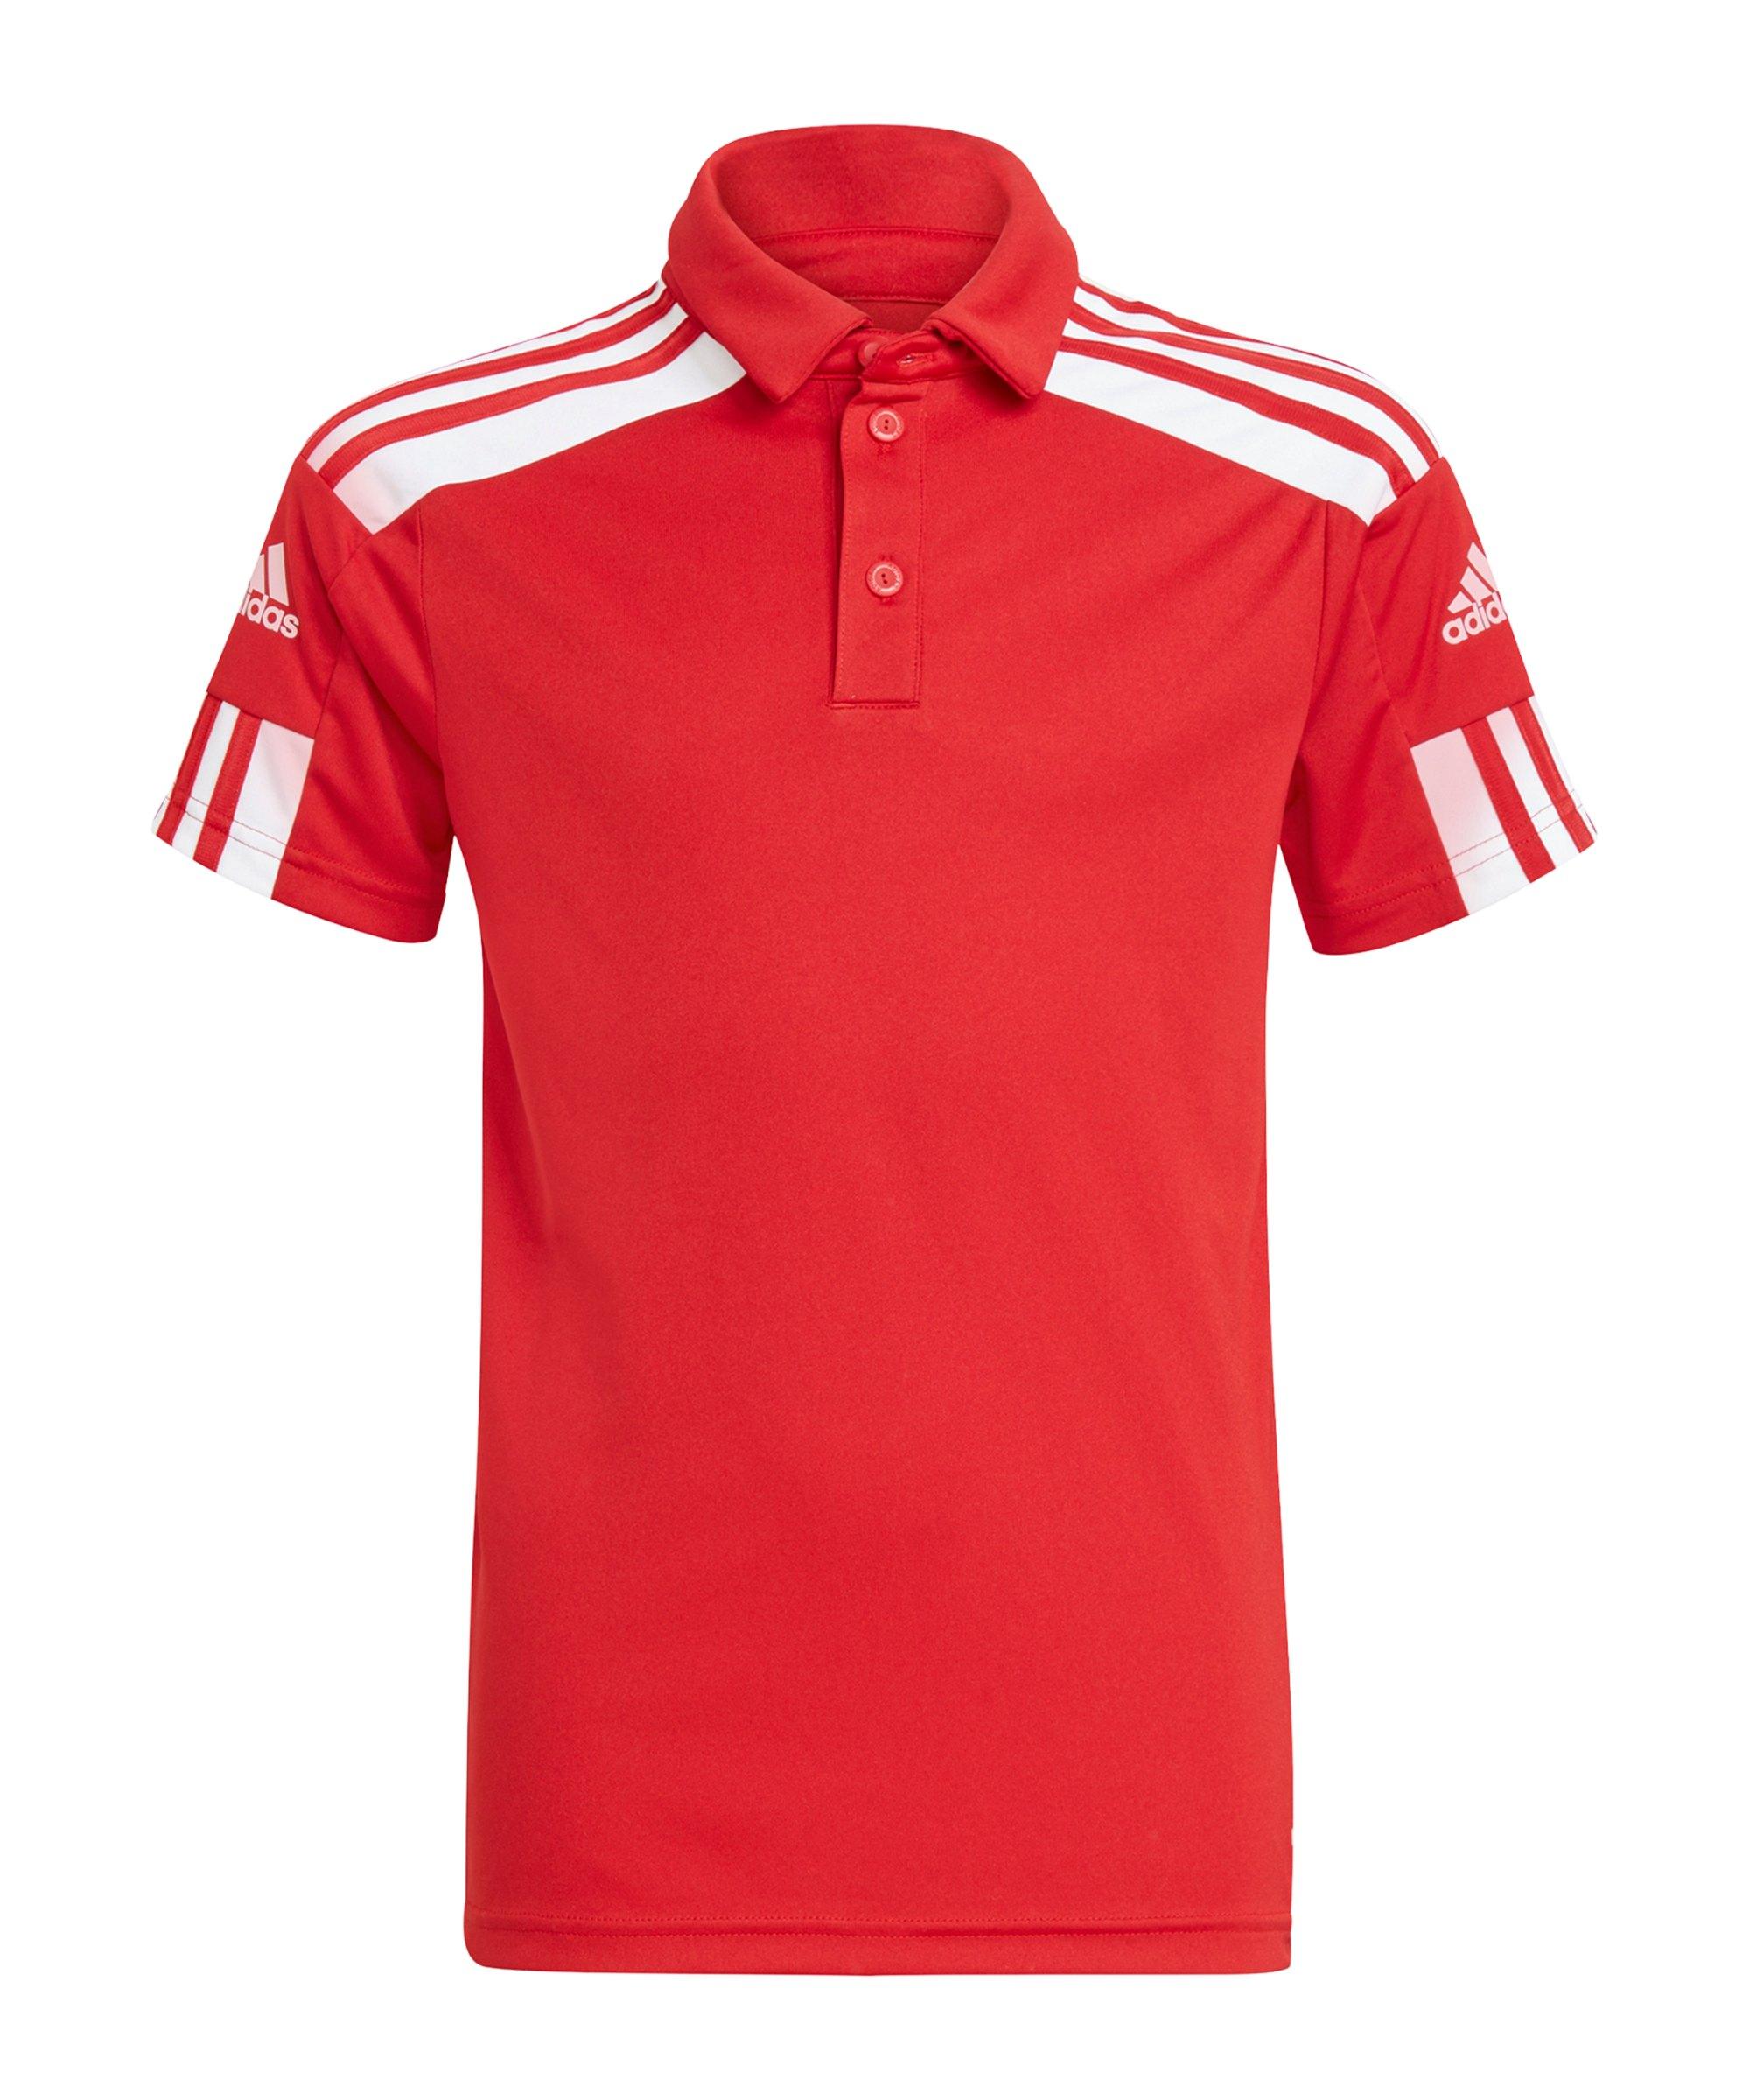 adidas Squadra 21 Poloshirt Kids Rot Weiss - rot